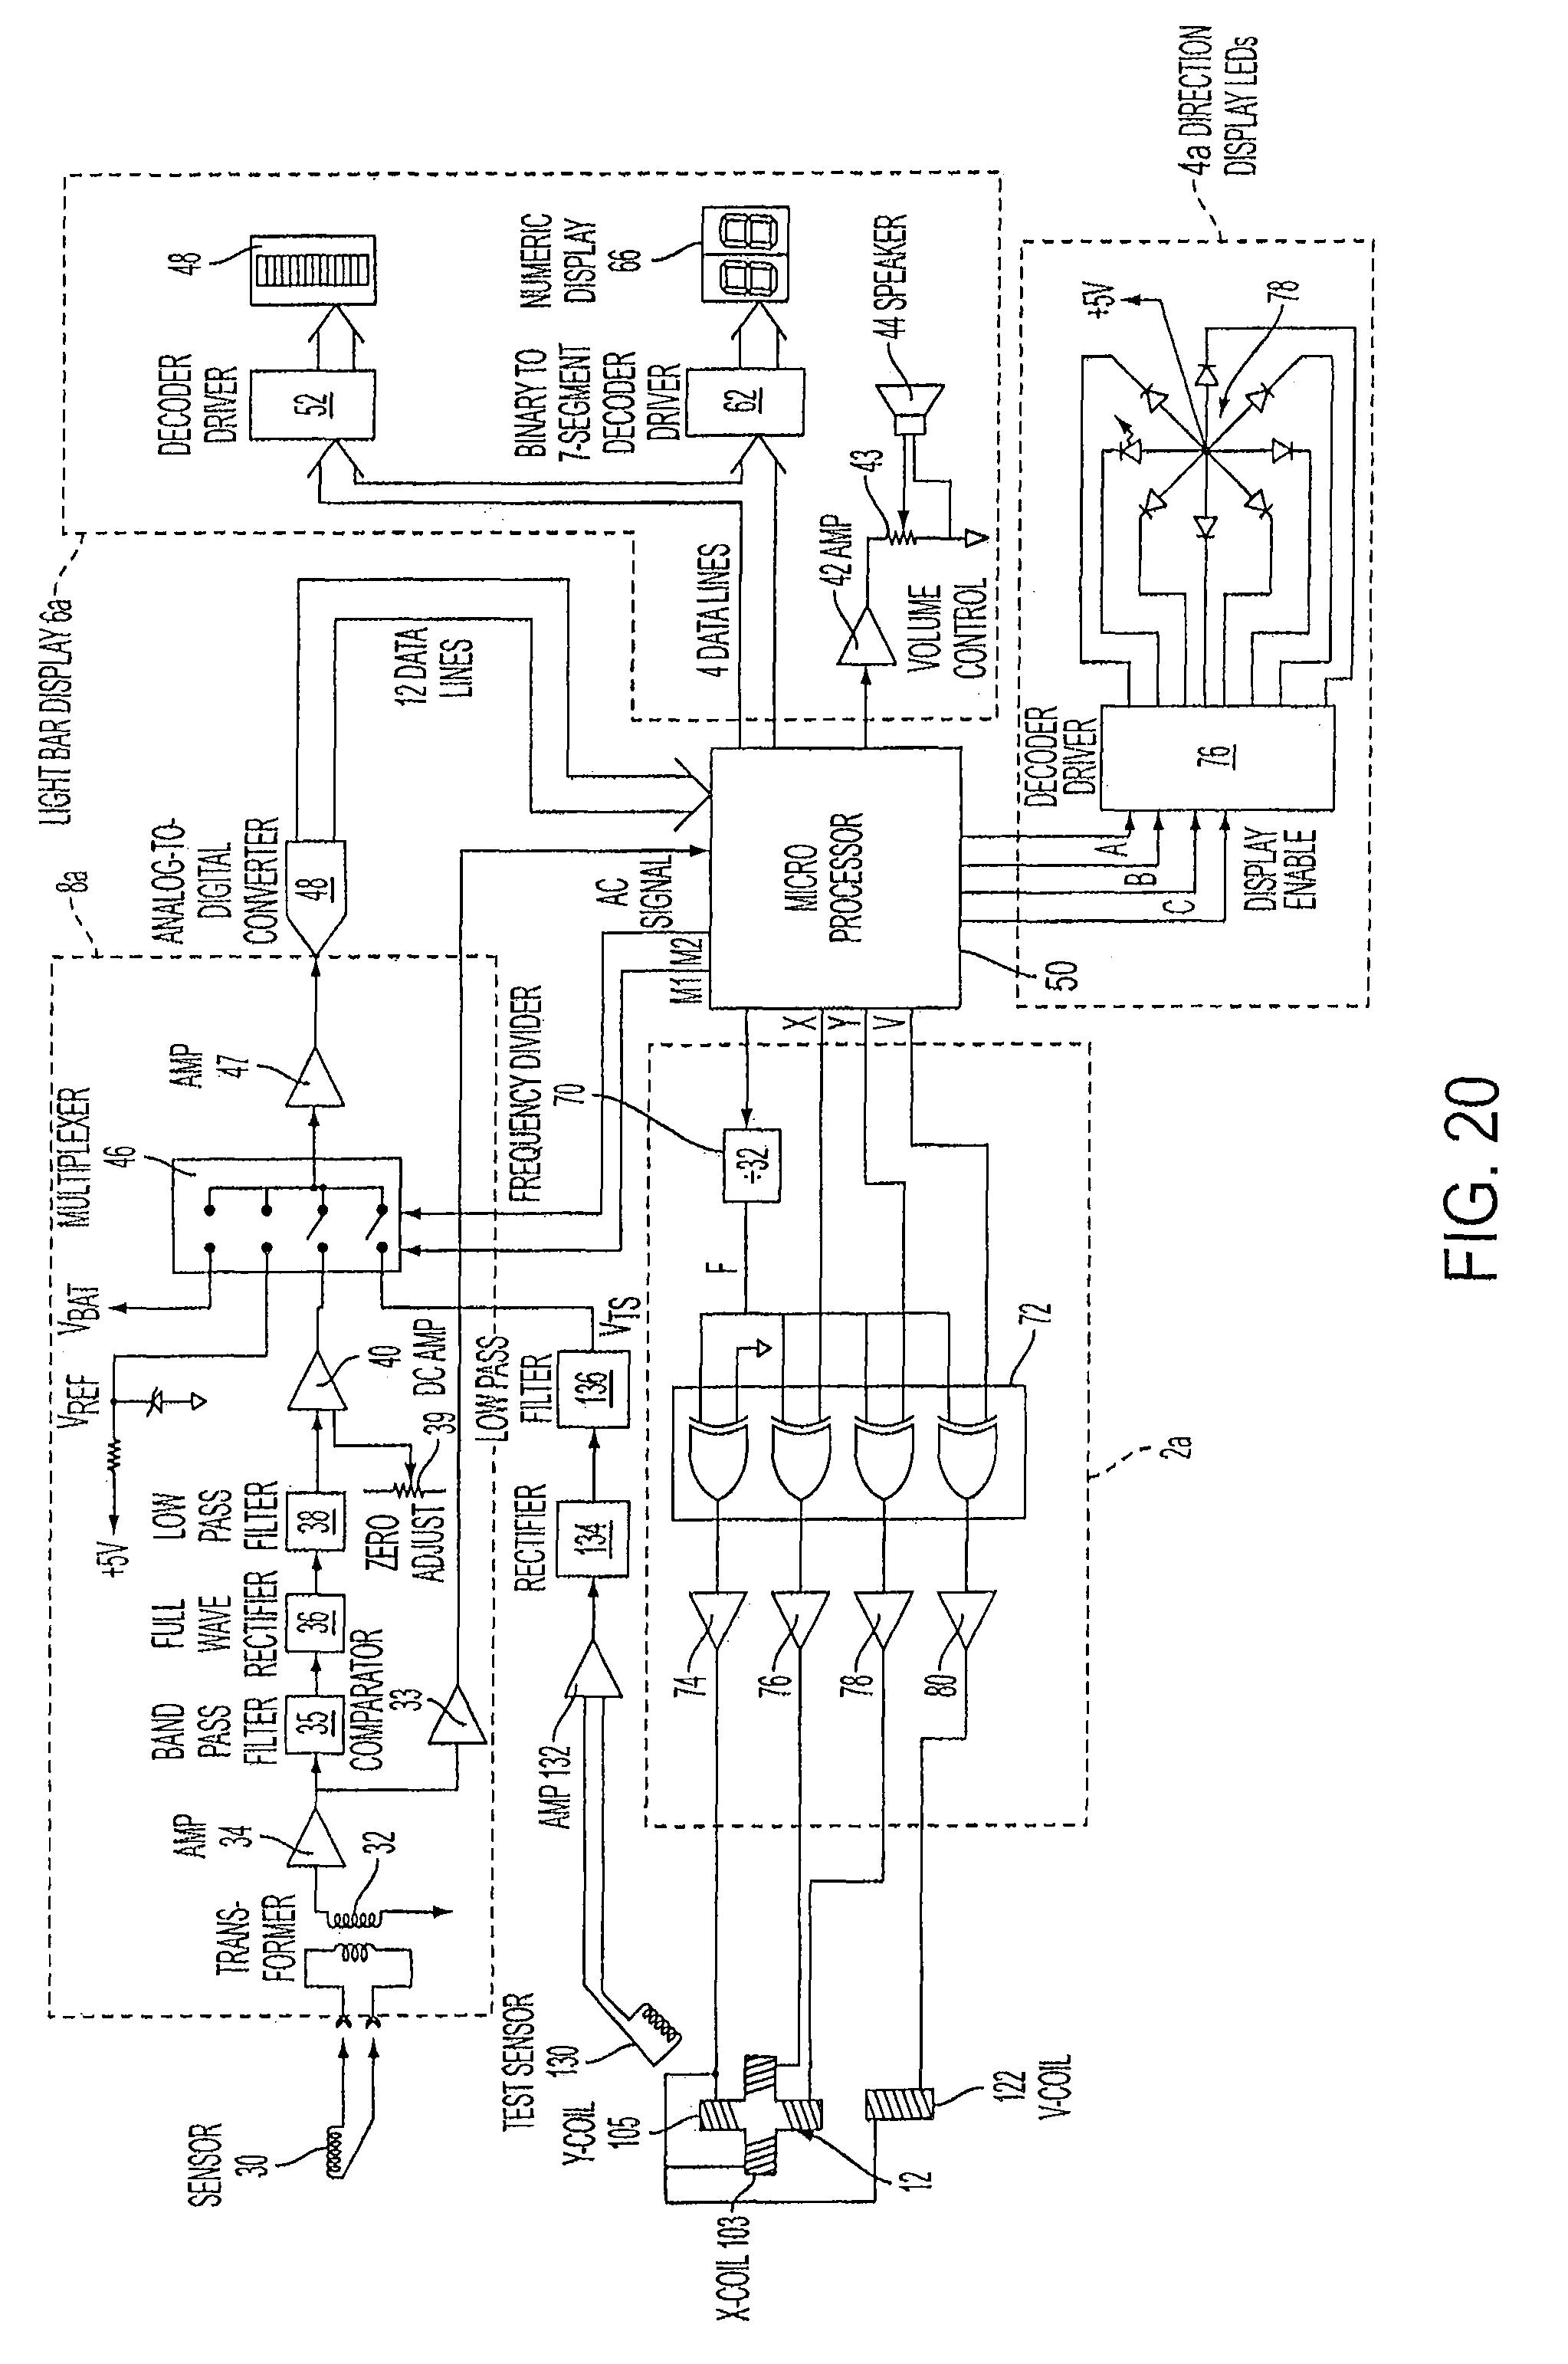 John Deere Amt 626 Wiring Diagram Schematic Diagrams 600 622 Diy Enthusiasts U2022 5 Wheel Gator